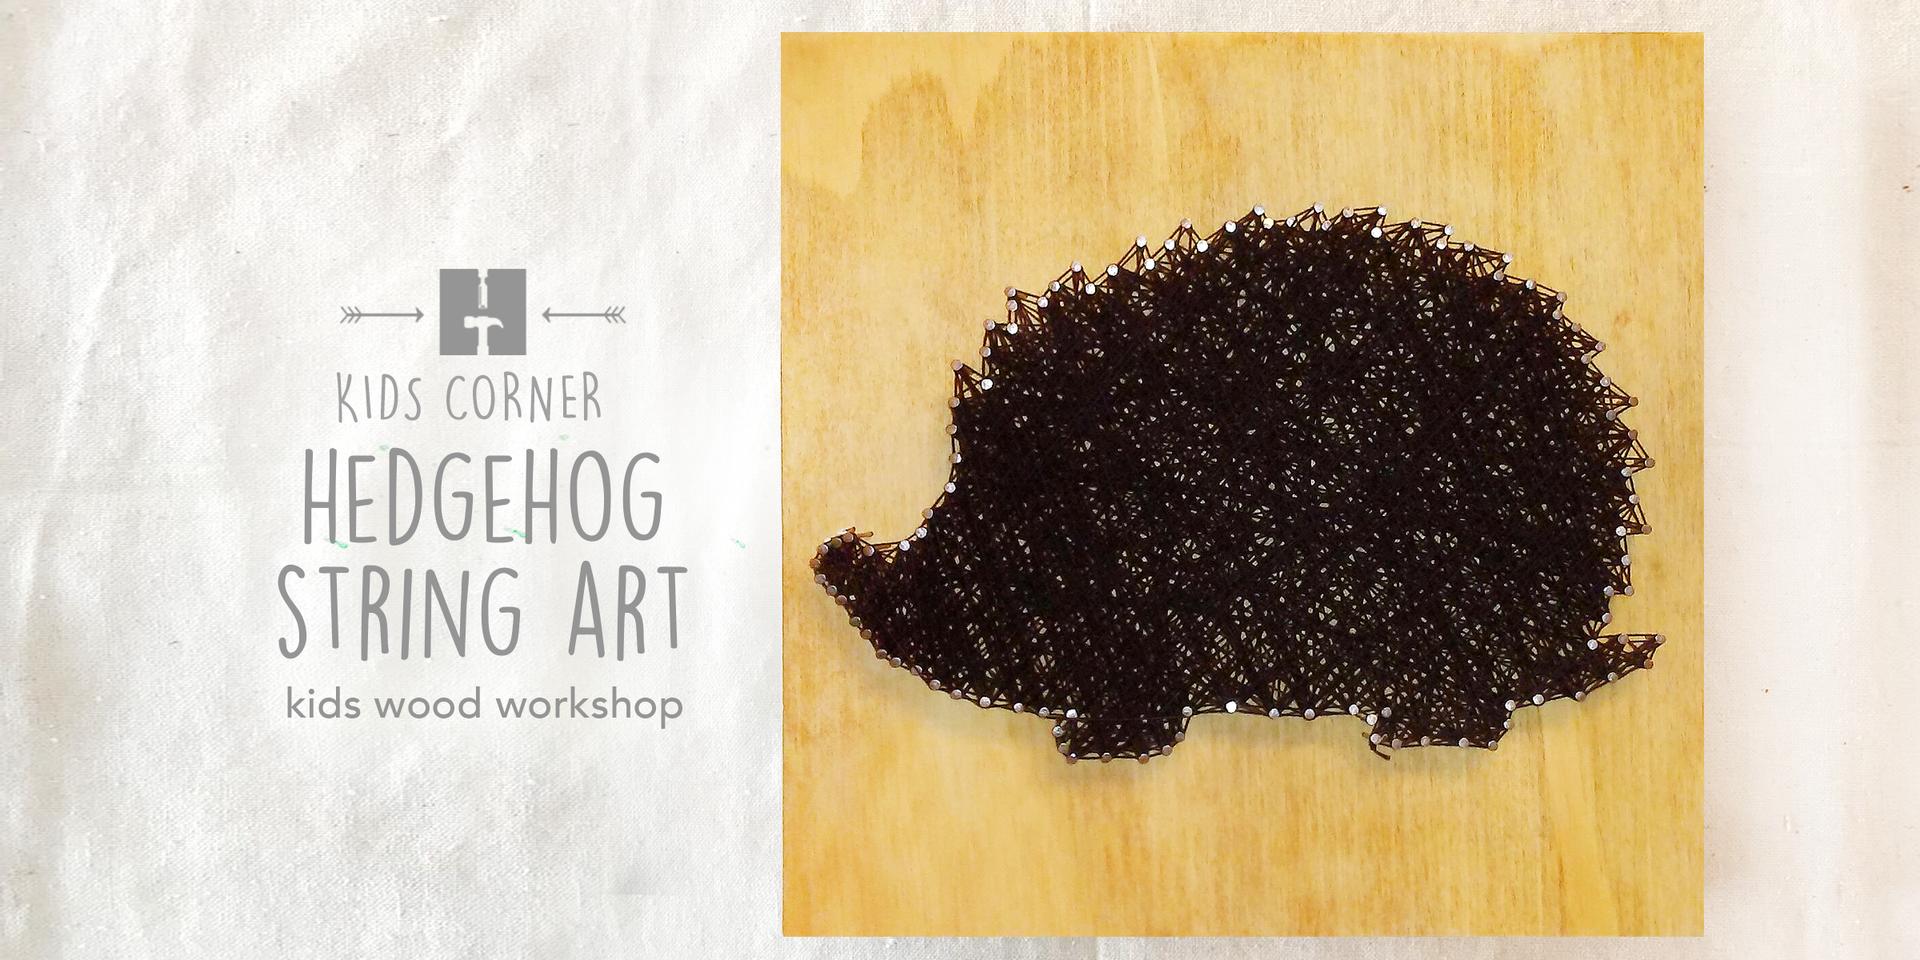 Hedgehog String Art